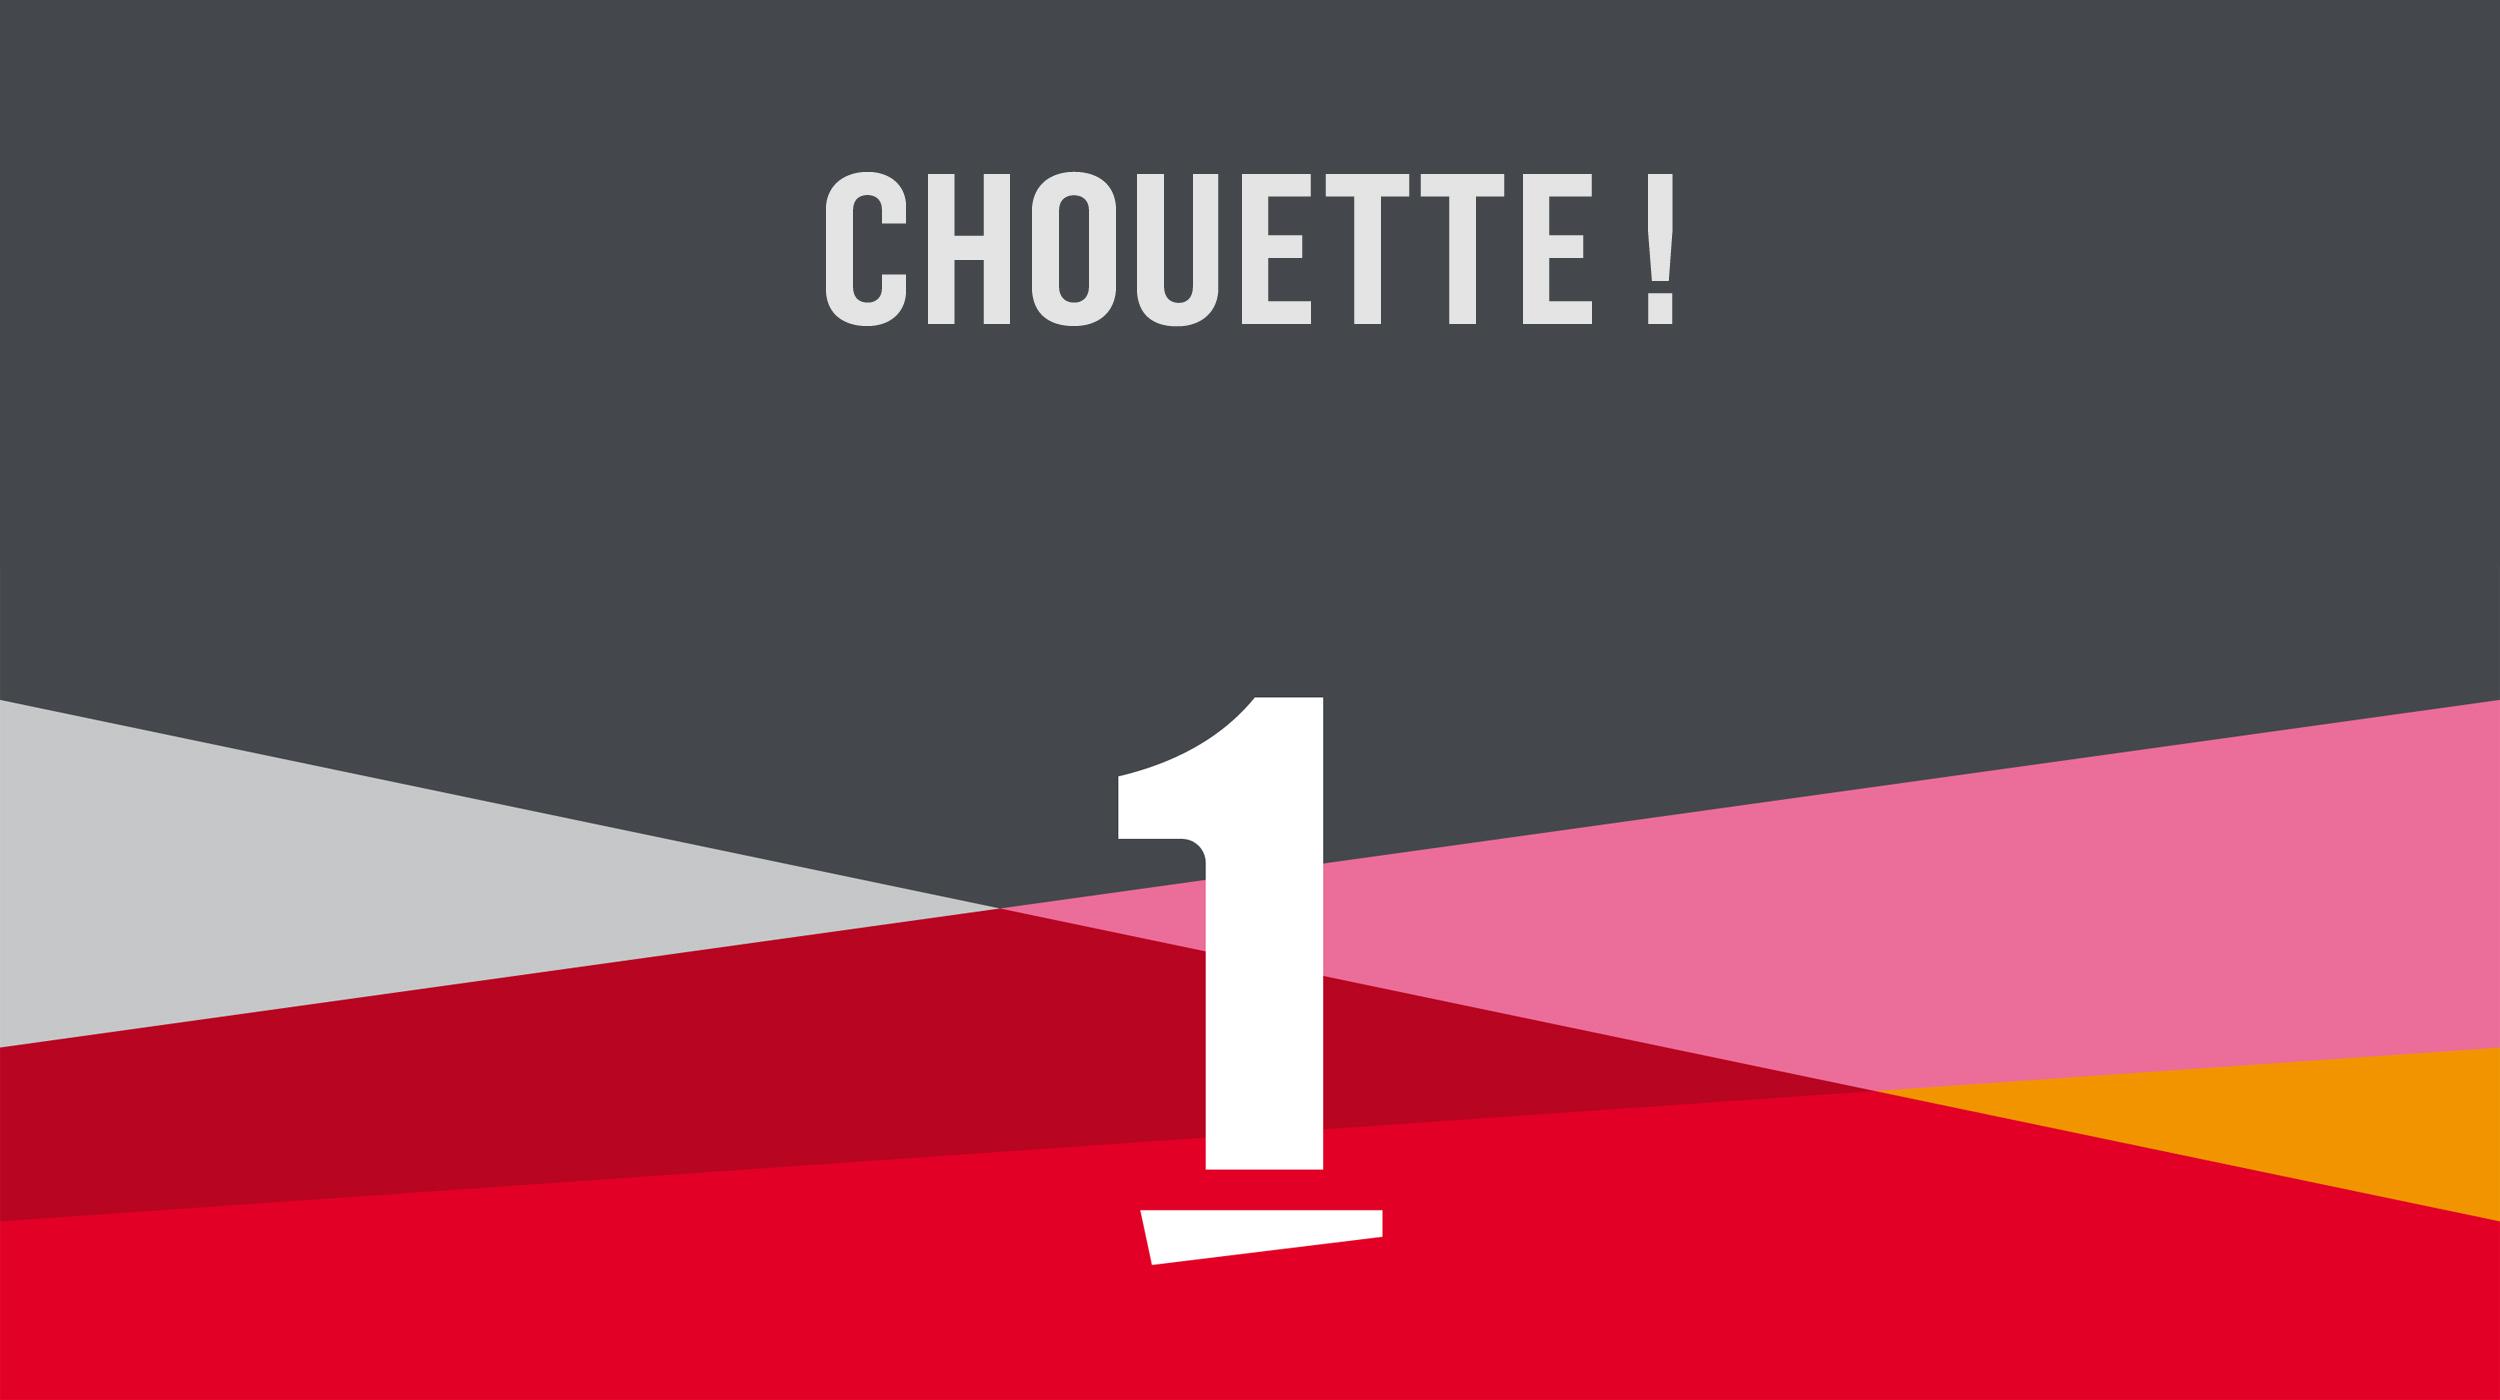 Logo Chouette ! jpg. [RTS]